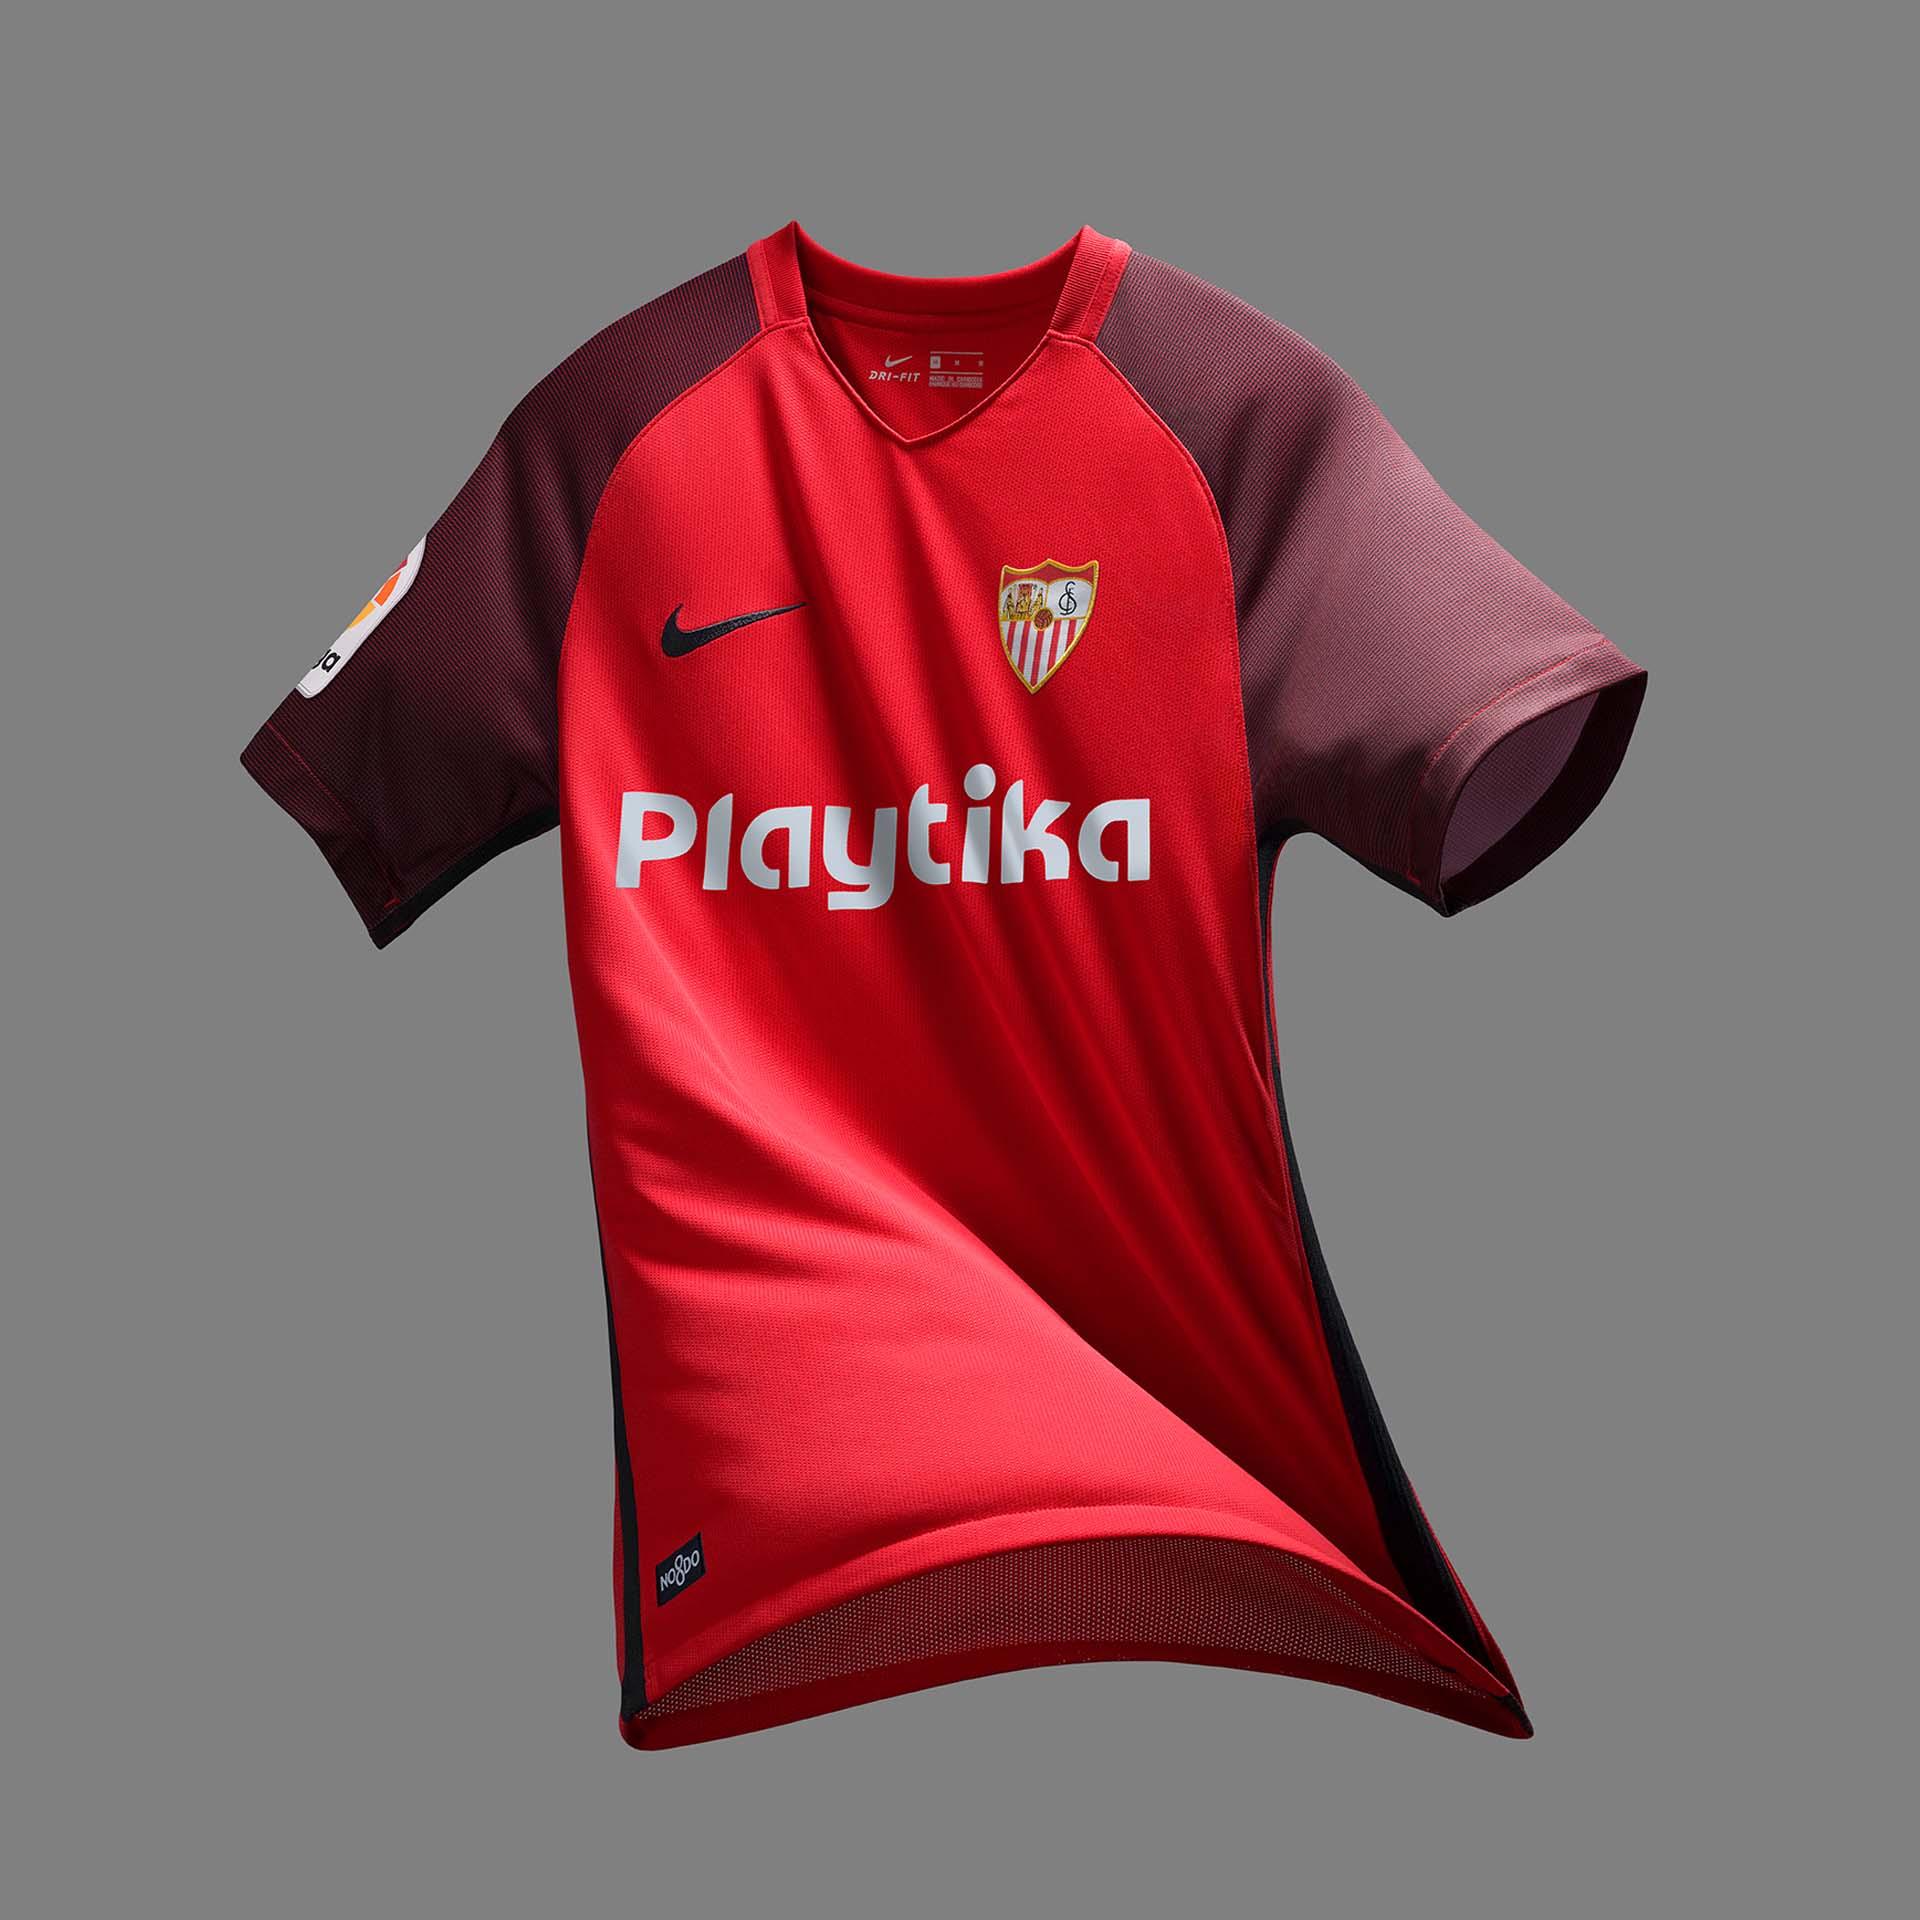 79769bdab01 2-sevilla-18-19-kits.jpg. Sevilla 2018 19 Away Shirt